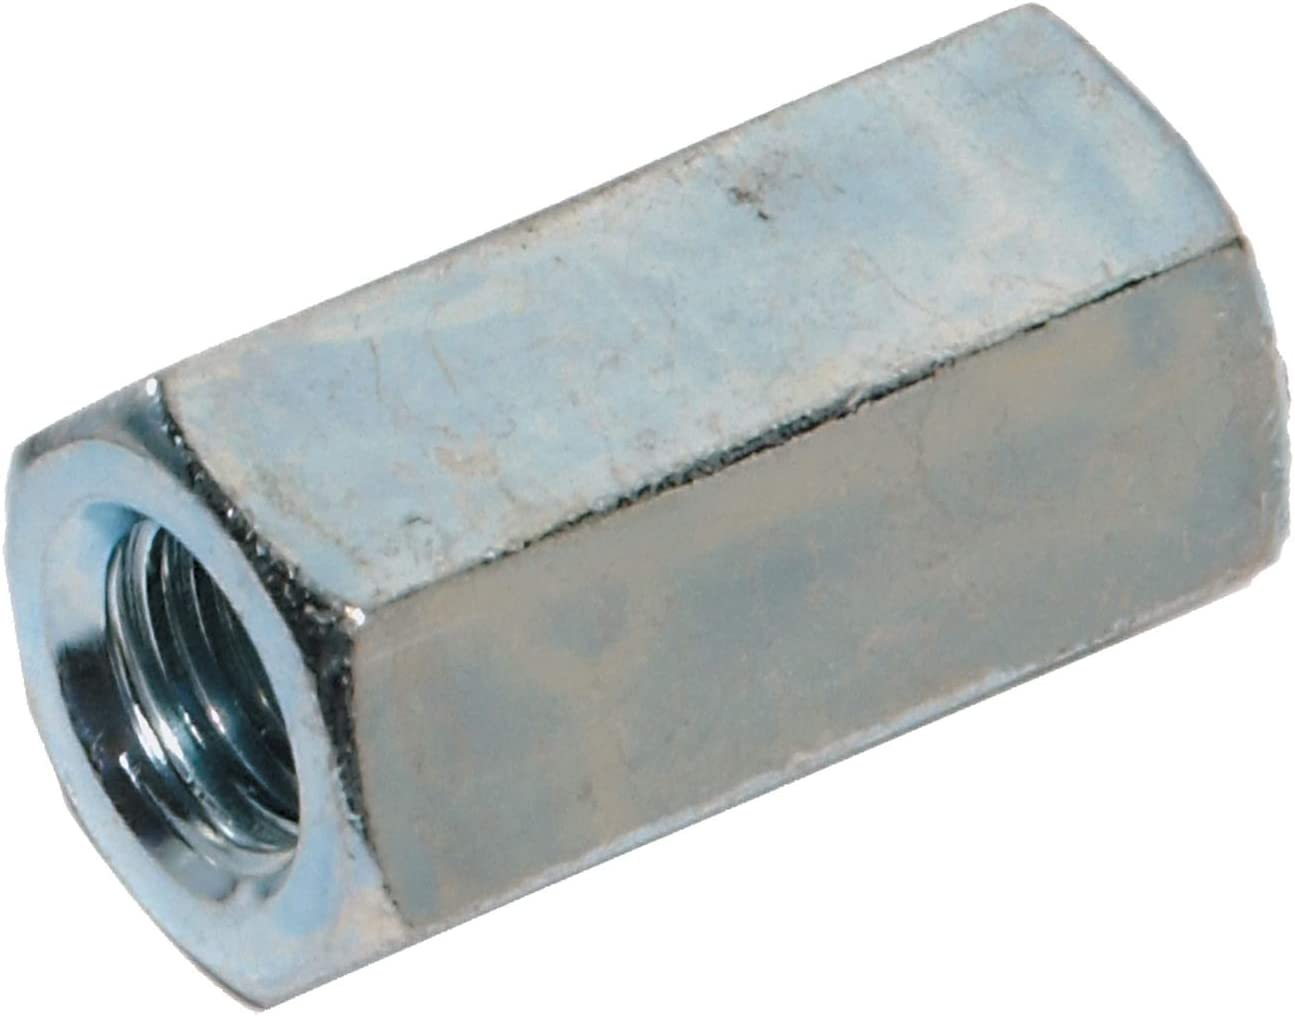 3//8-24 x W1//2 x 1 1//8 Fine Thread A563 Grade A Hex Rod Coupling Nut Low Carbon Steel Zinc Plated Pk 10